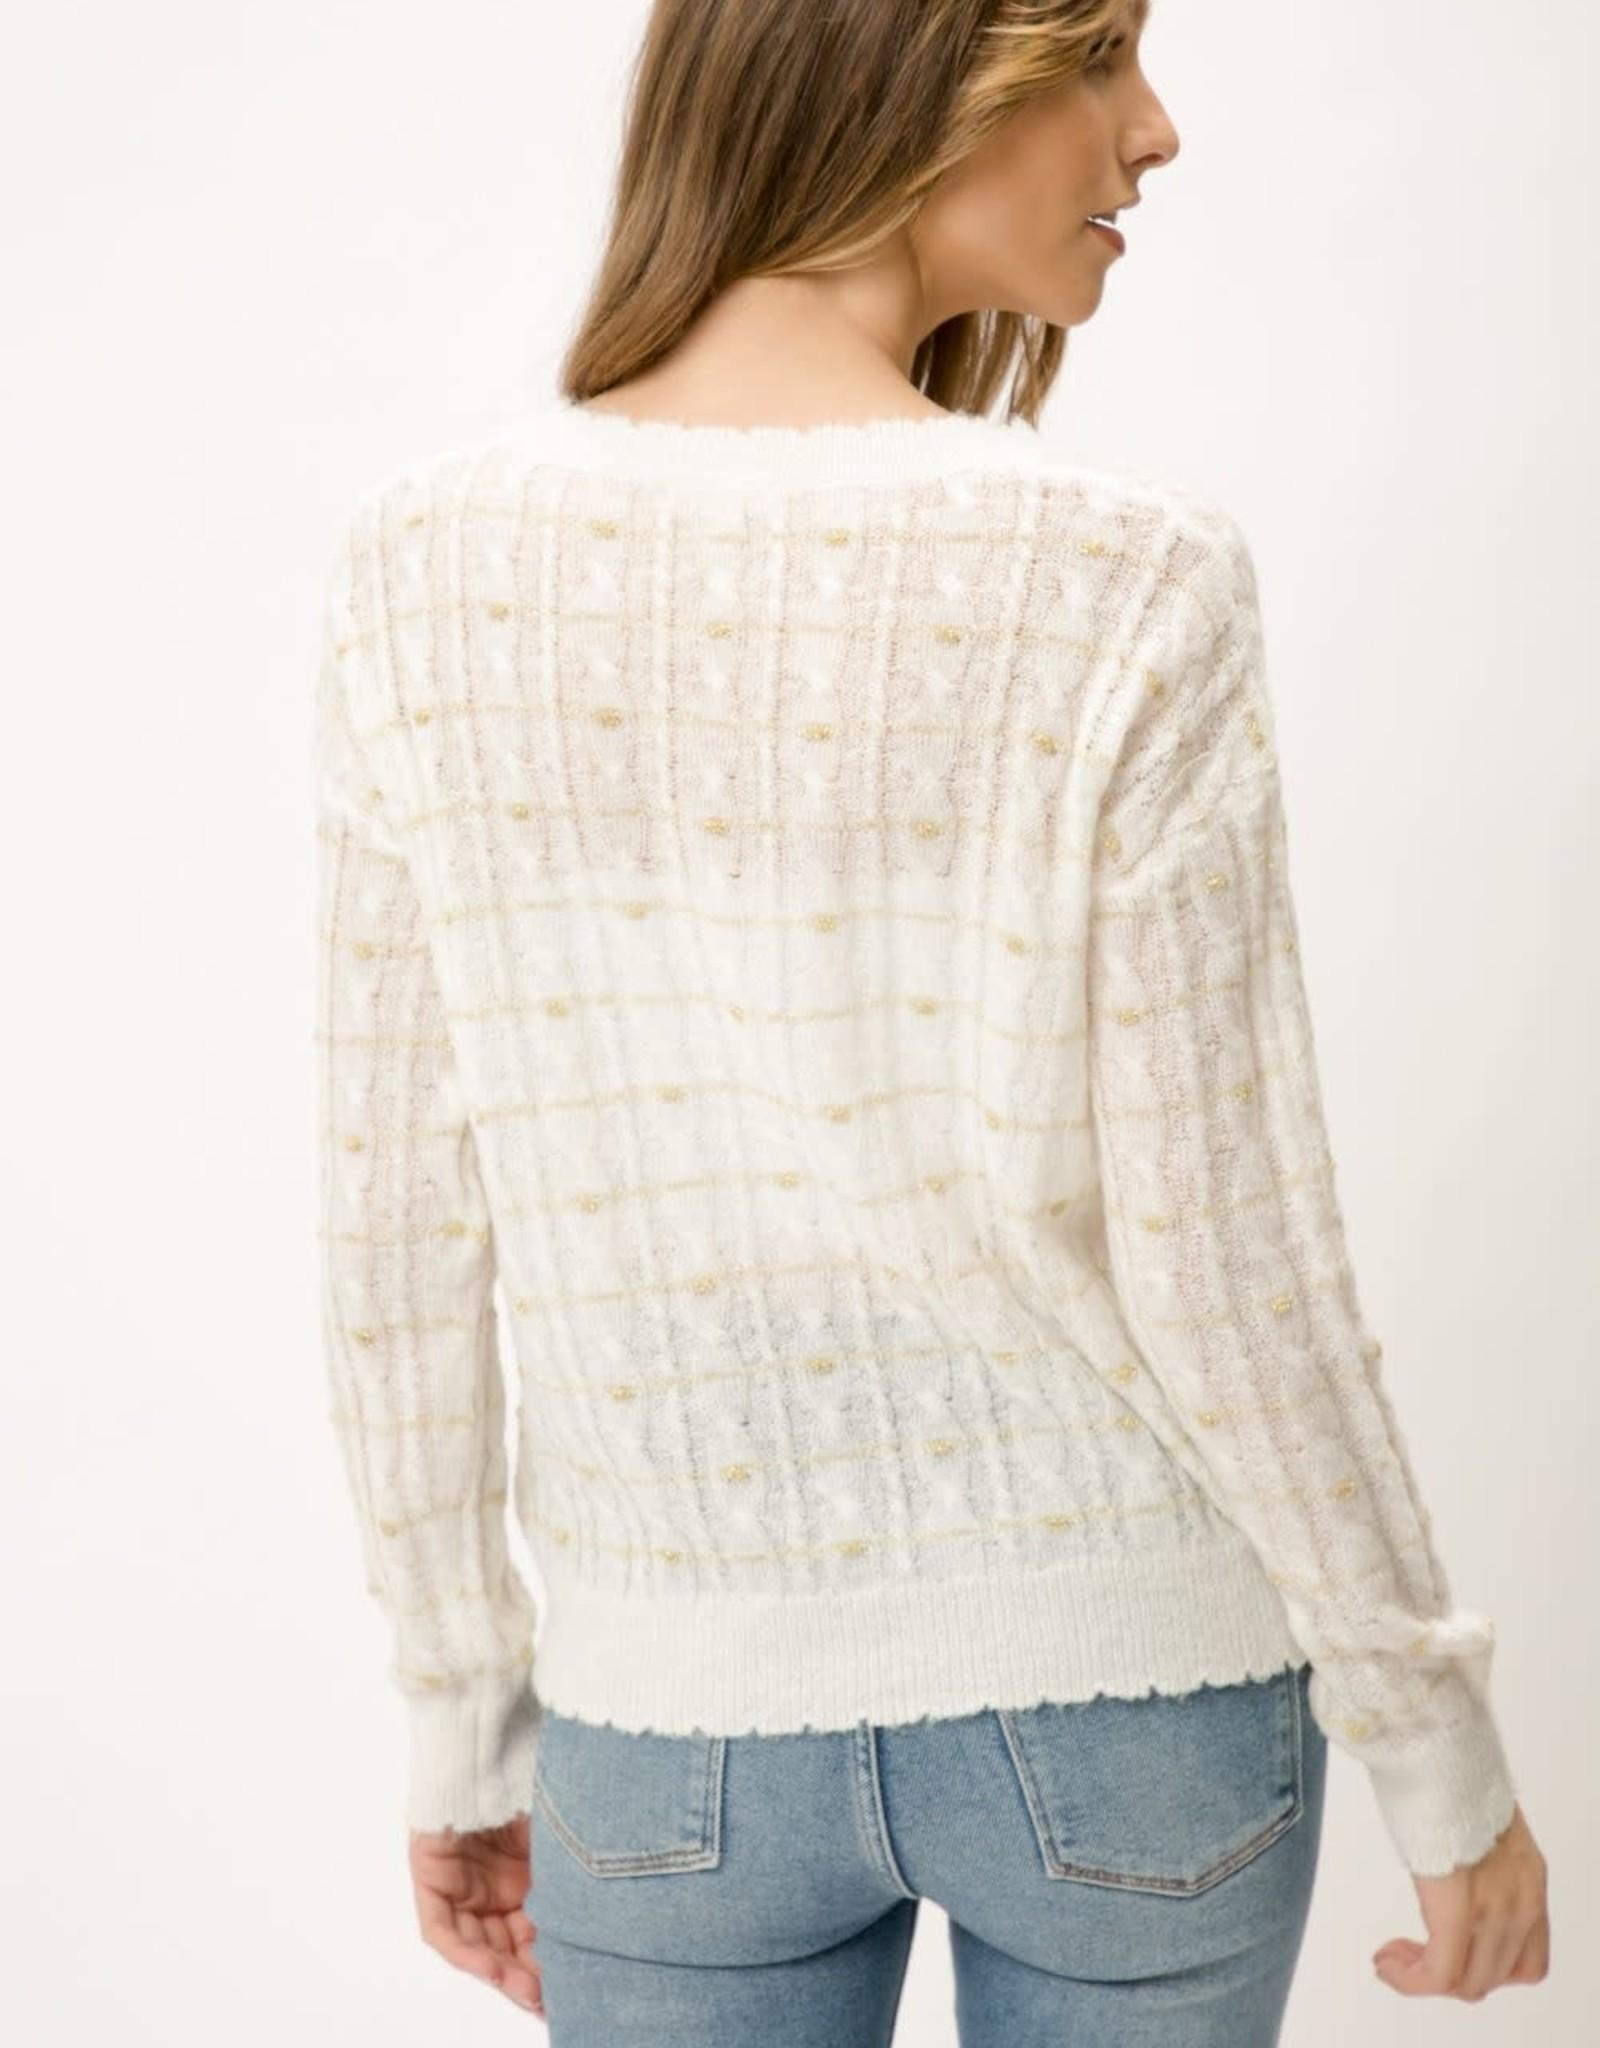 Ivory metallic v-neck sweater